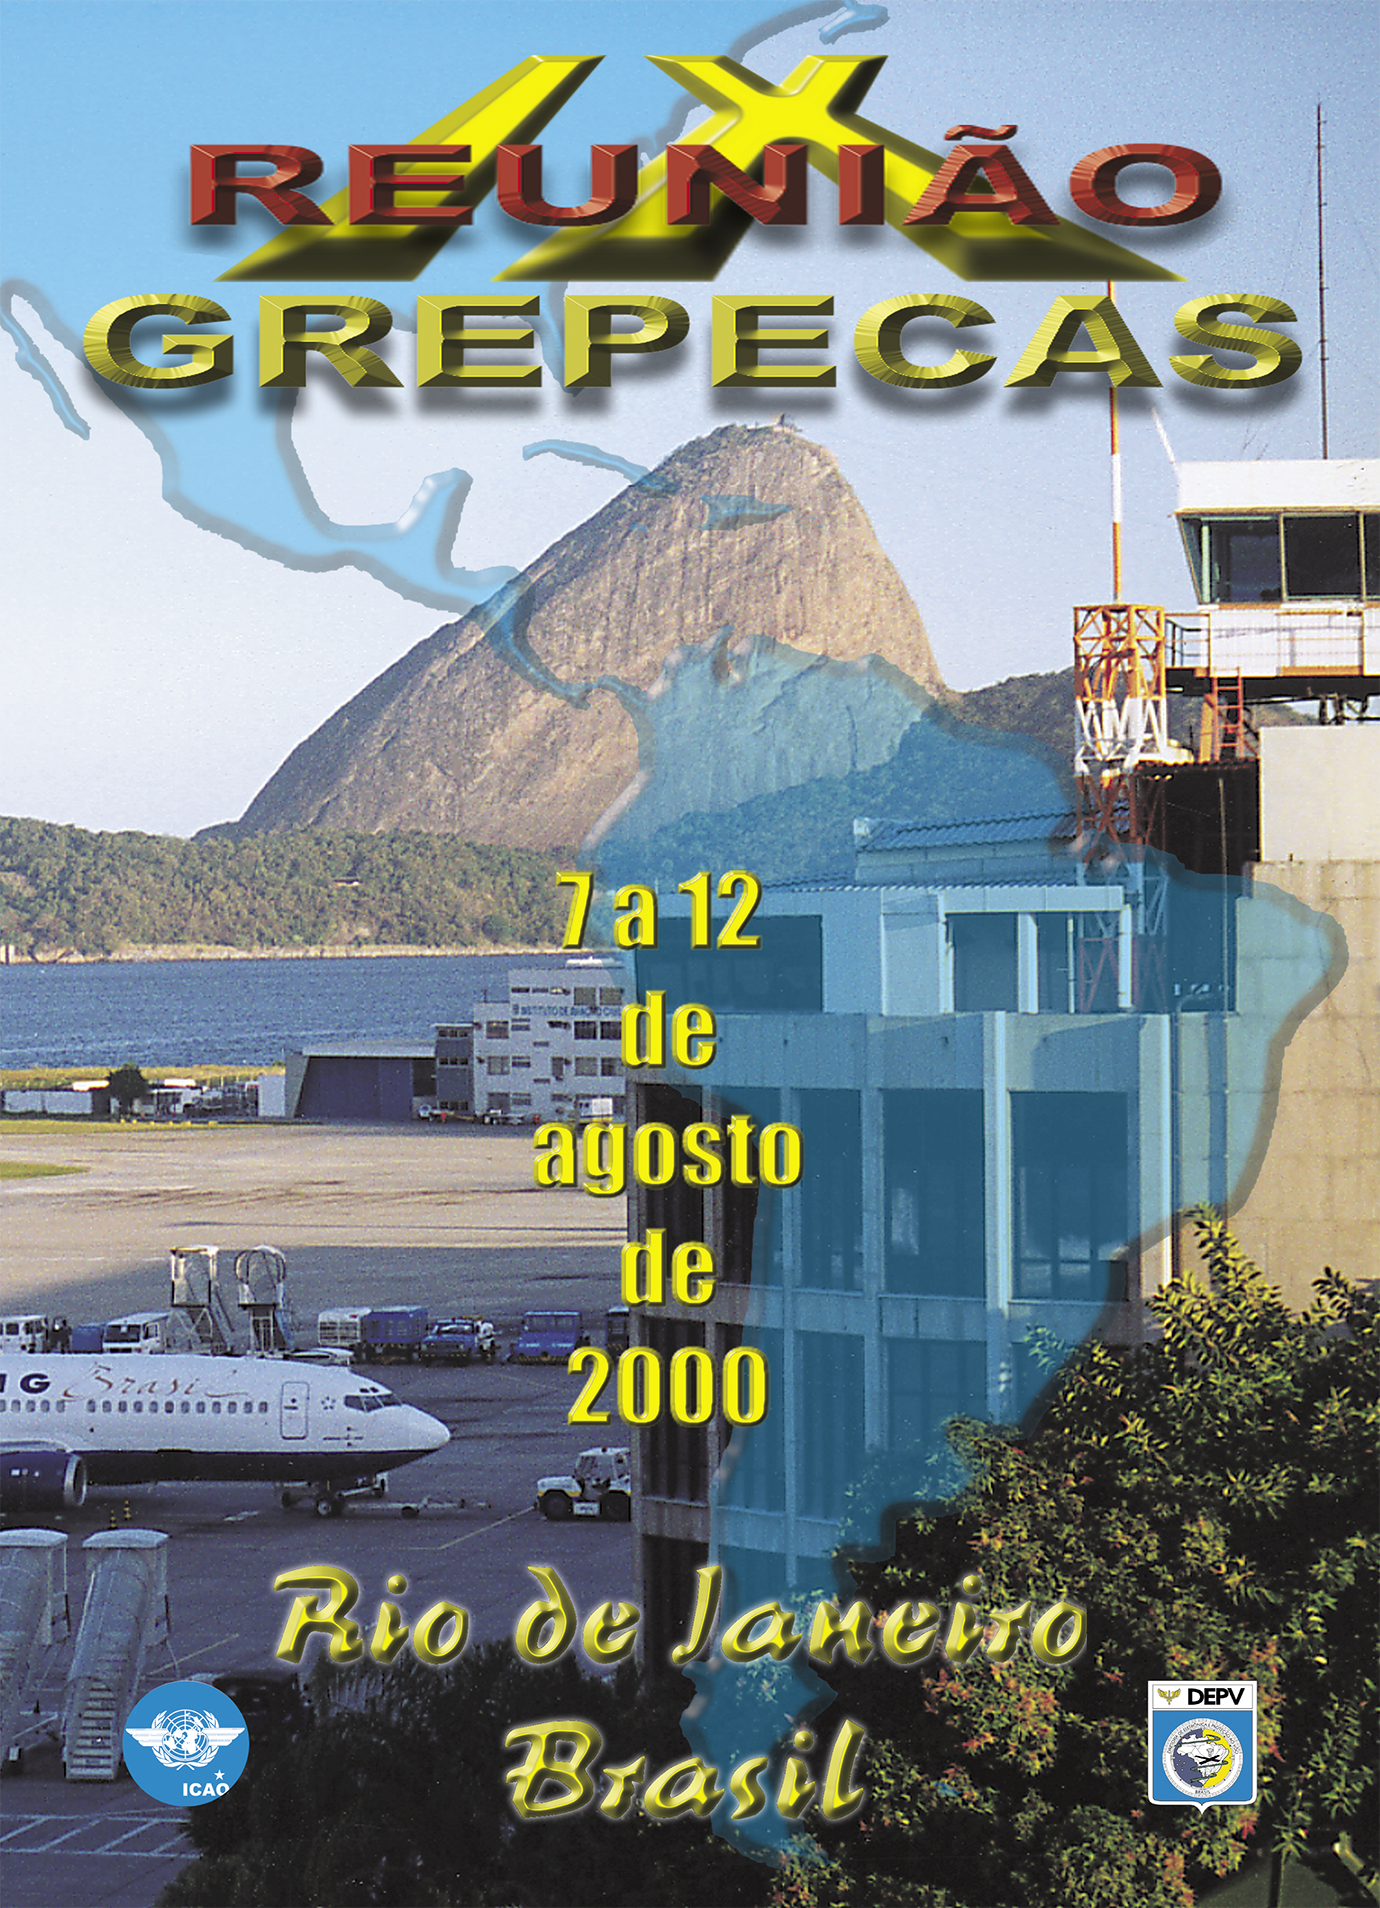 Grepecas 9